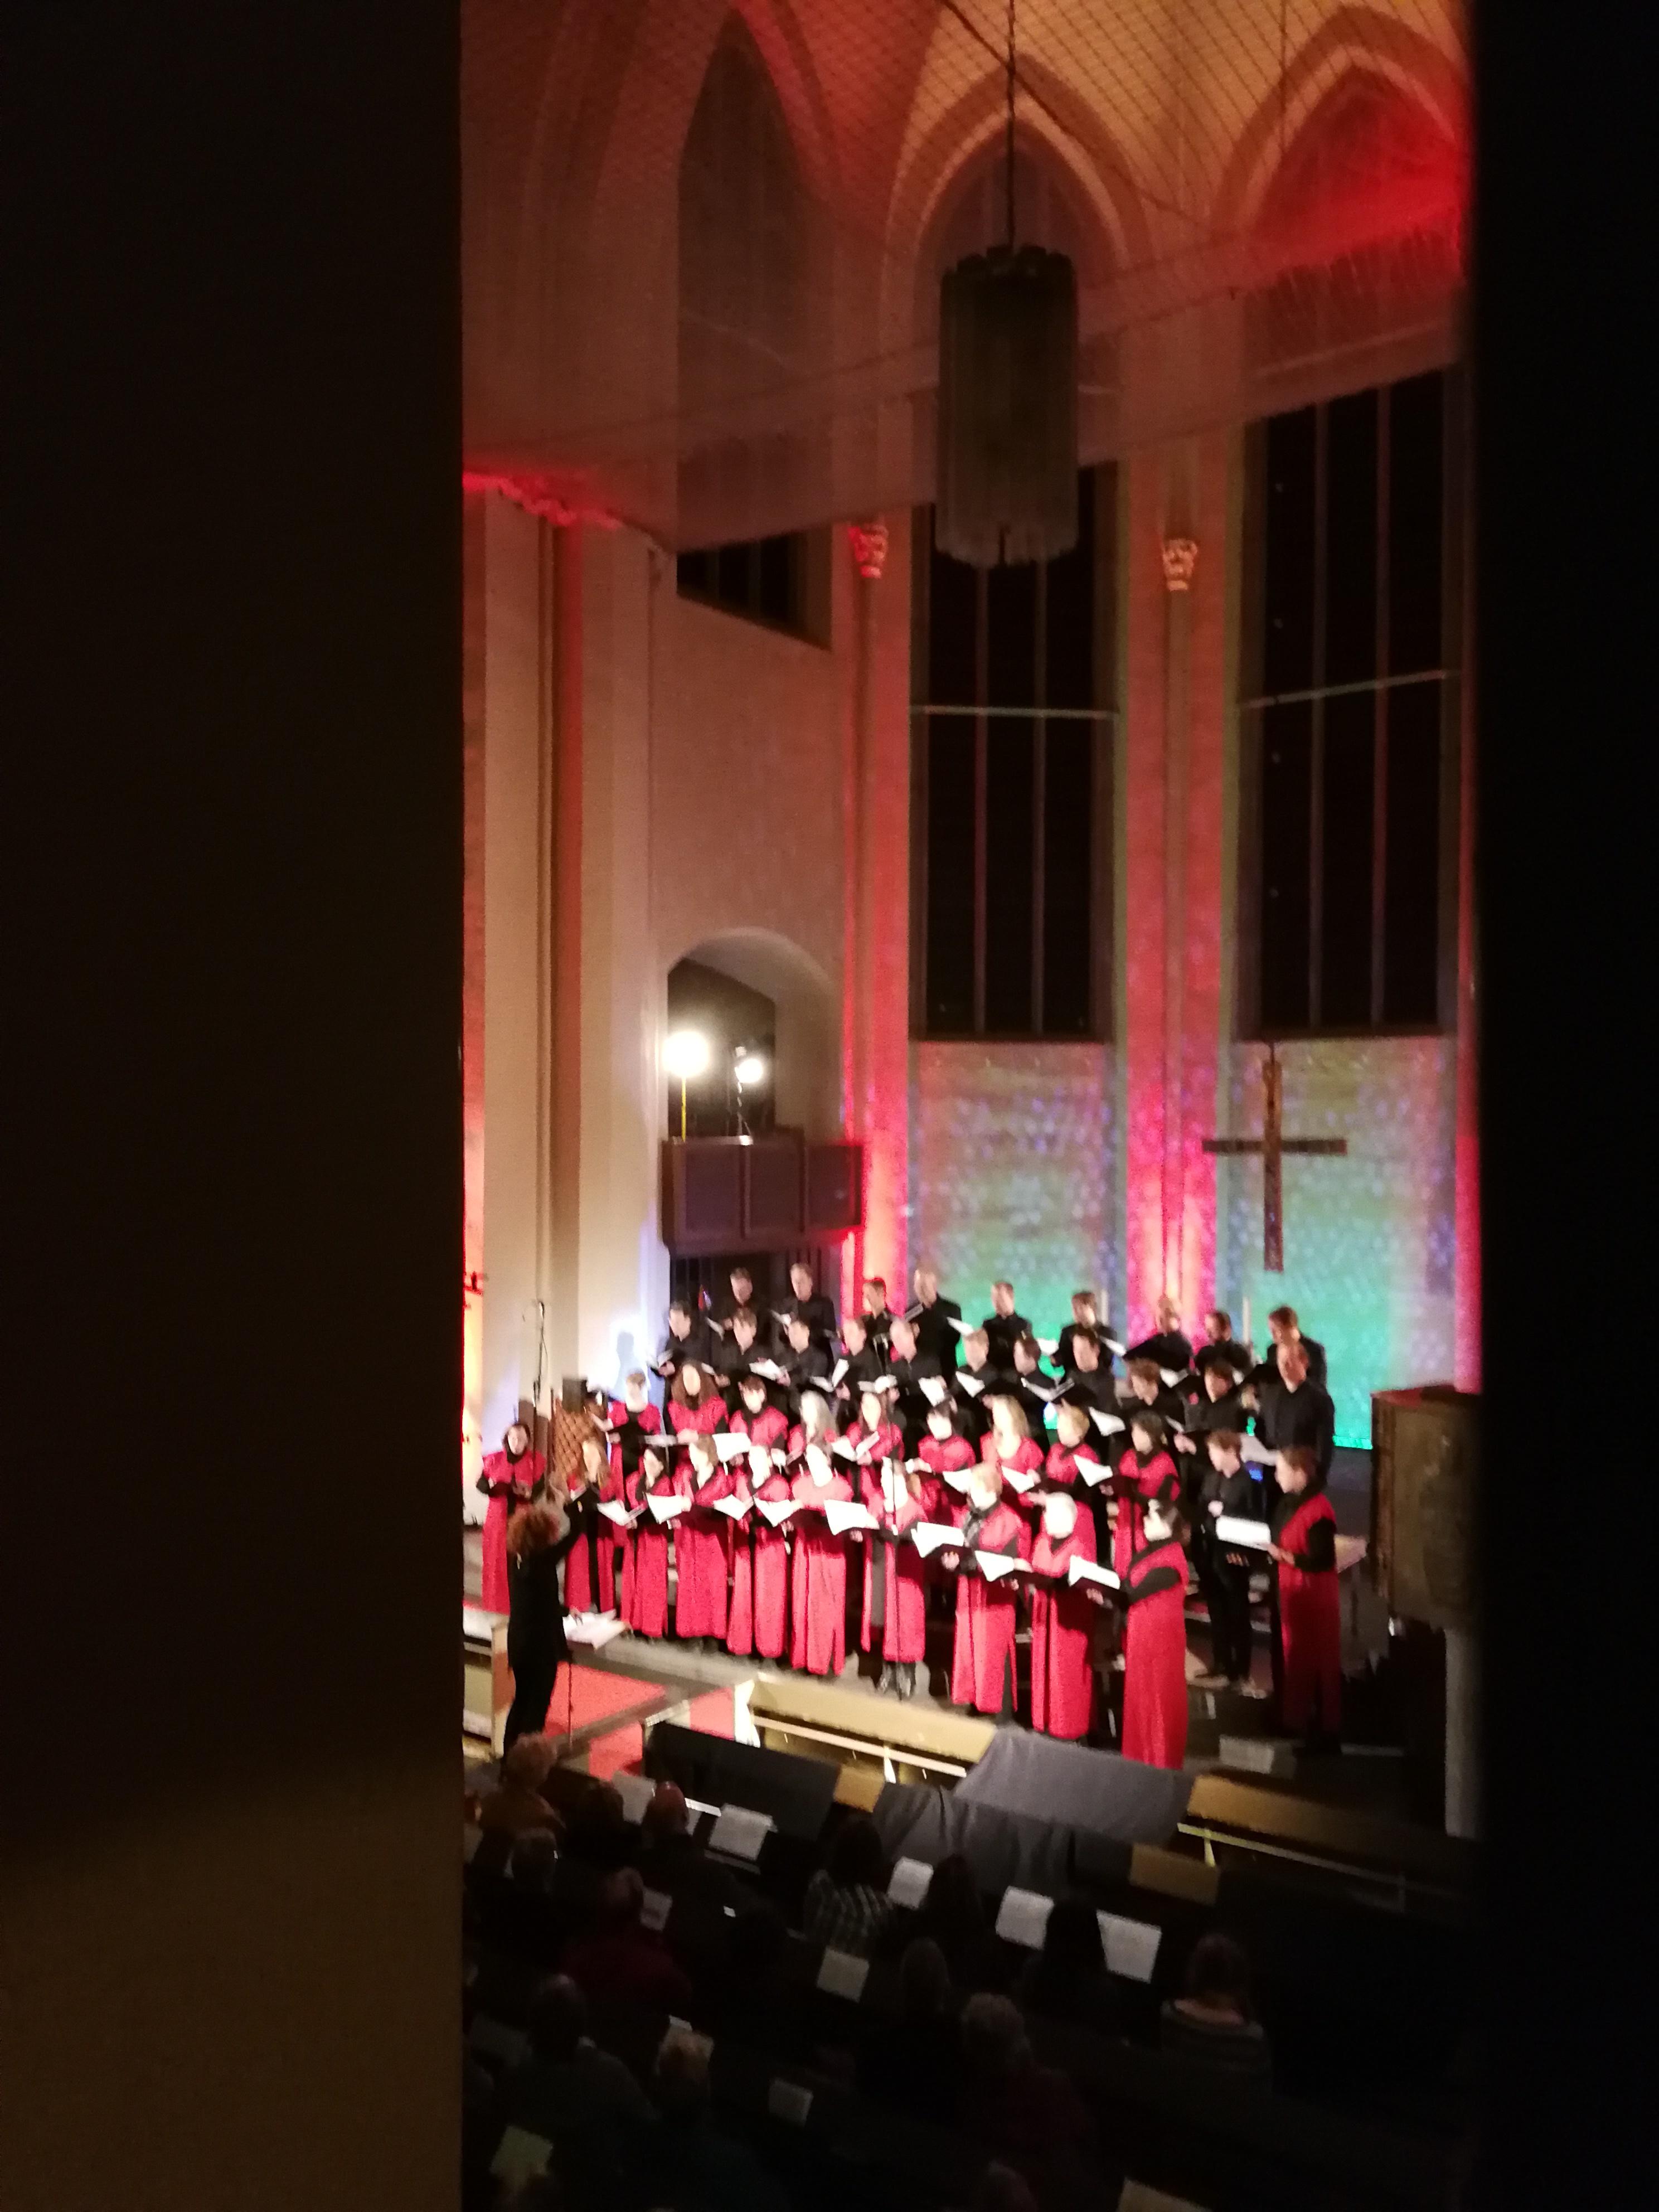 01-12-2018-Kirche_009